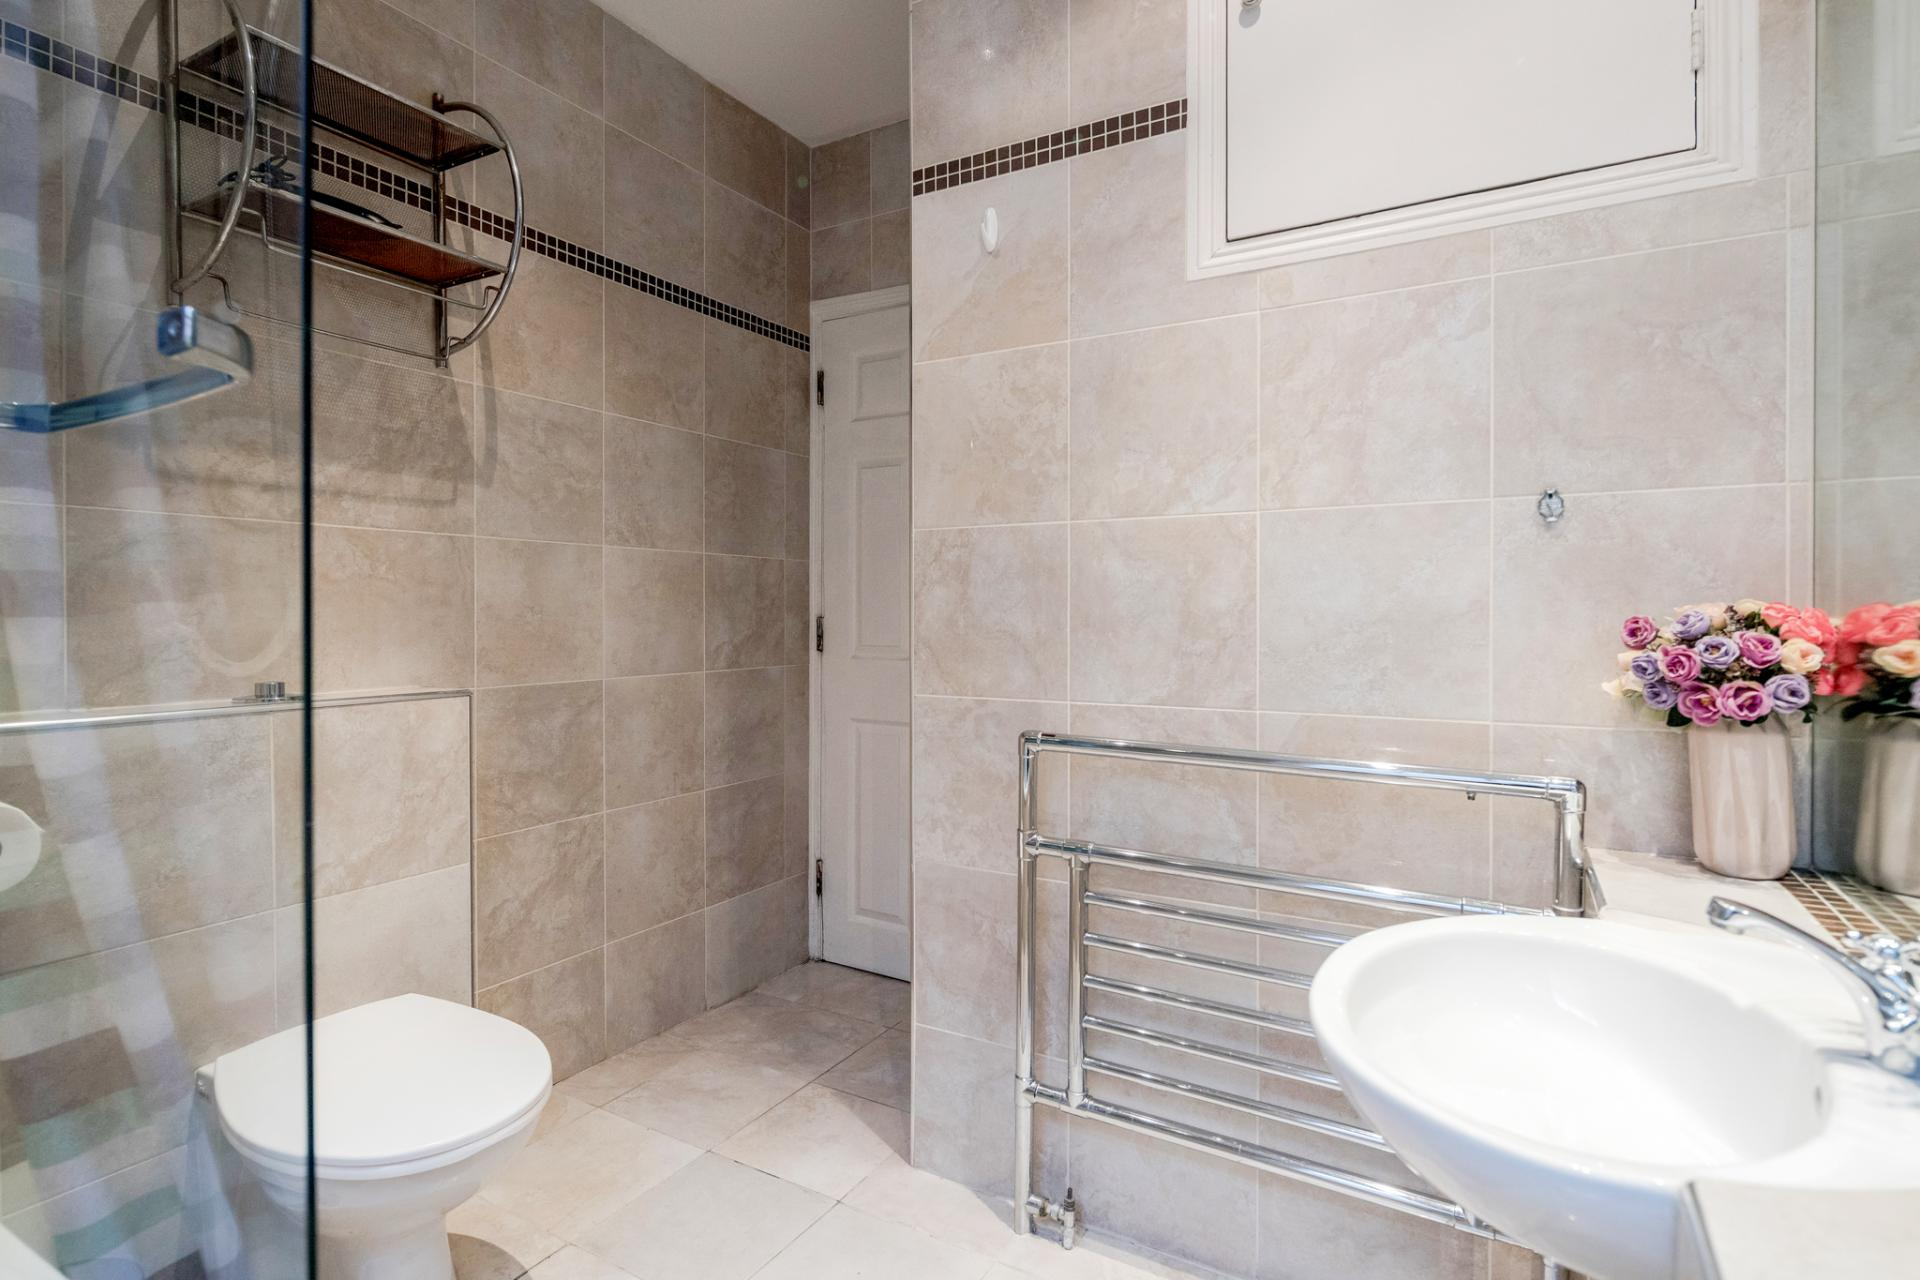 Shower at Kensington High Street, Kensington, London - Citybase Apartments